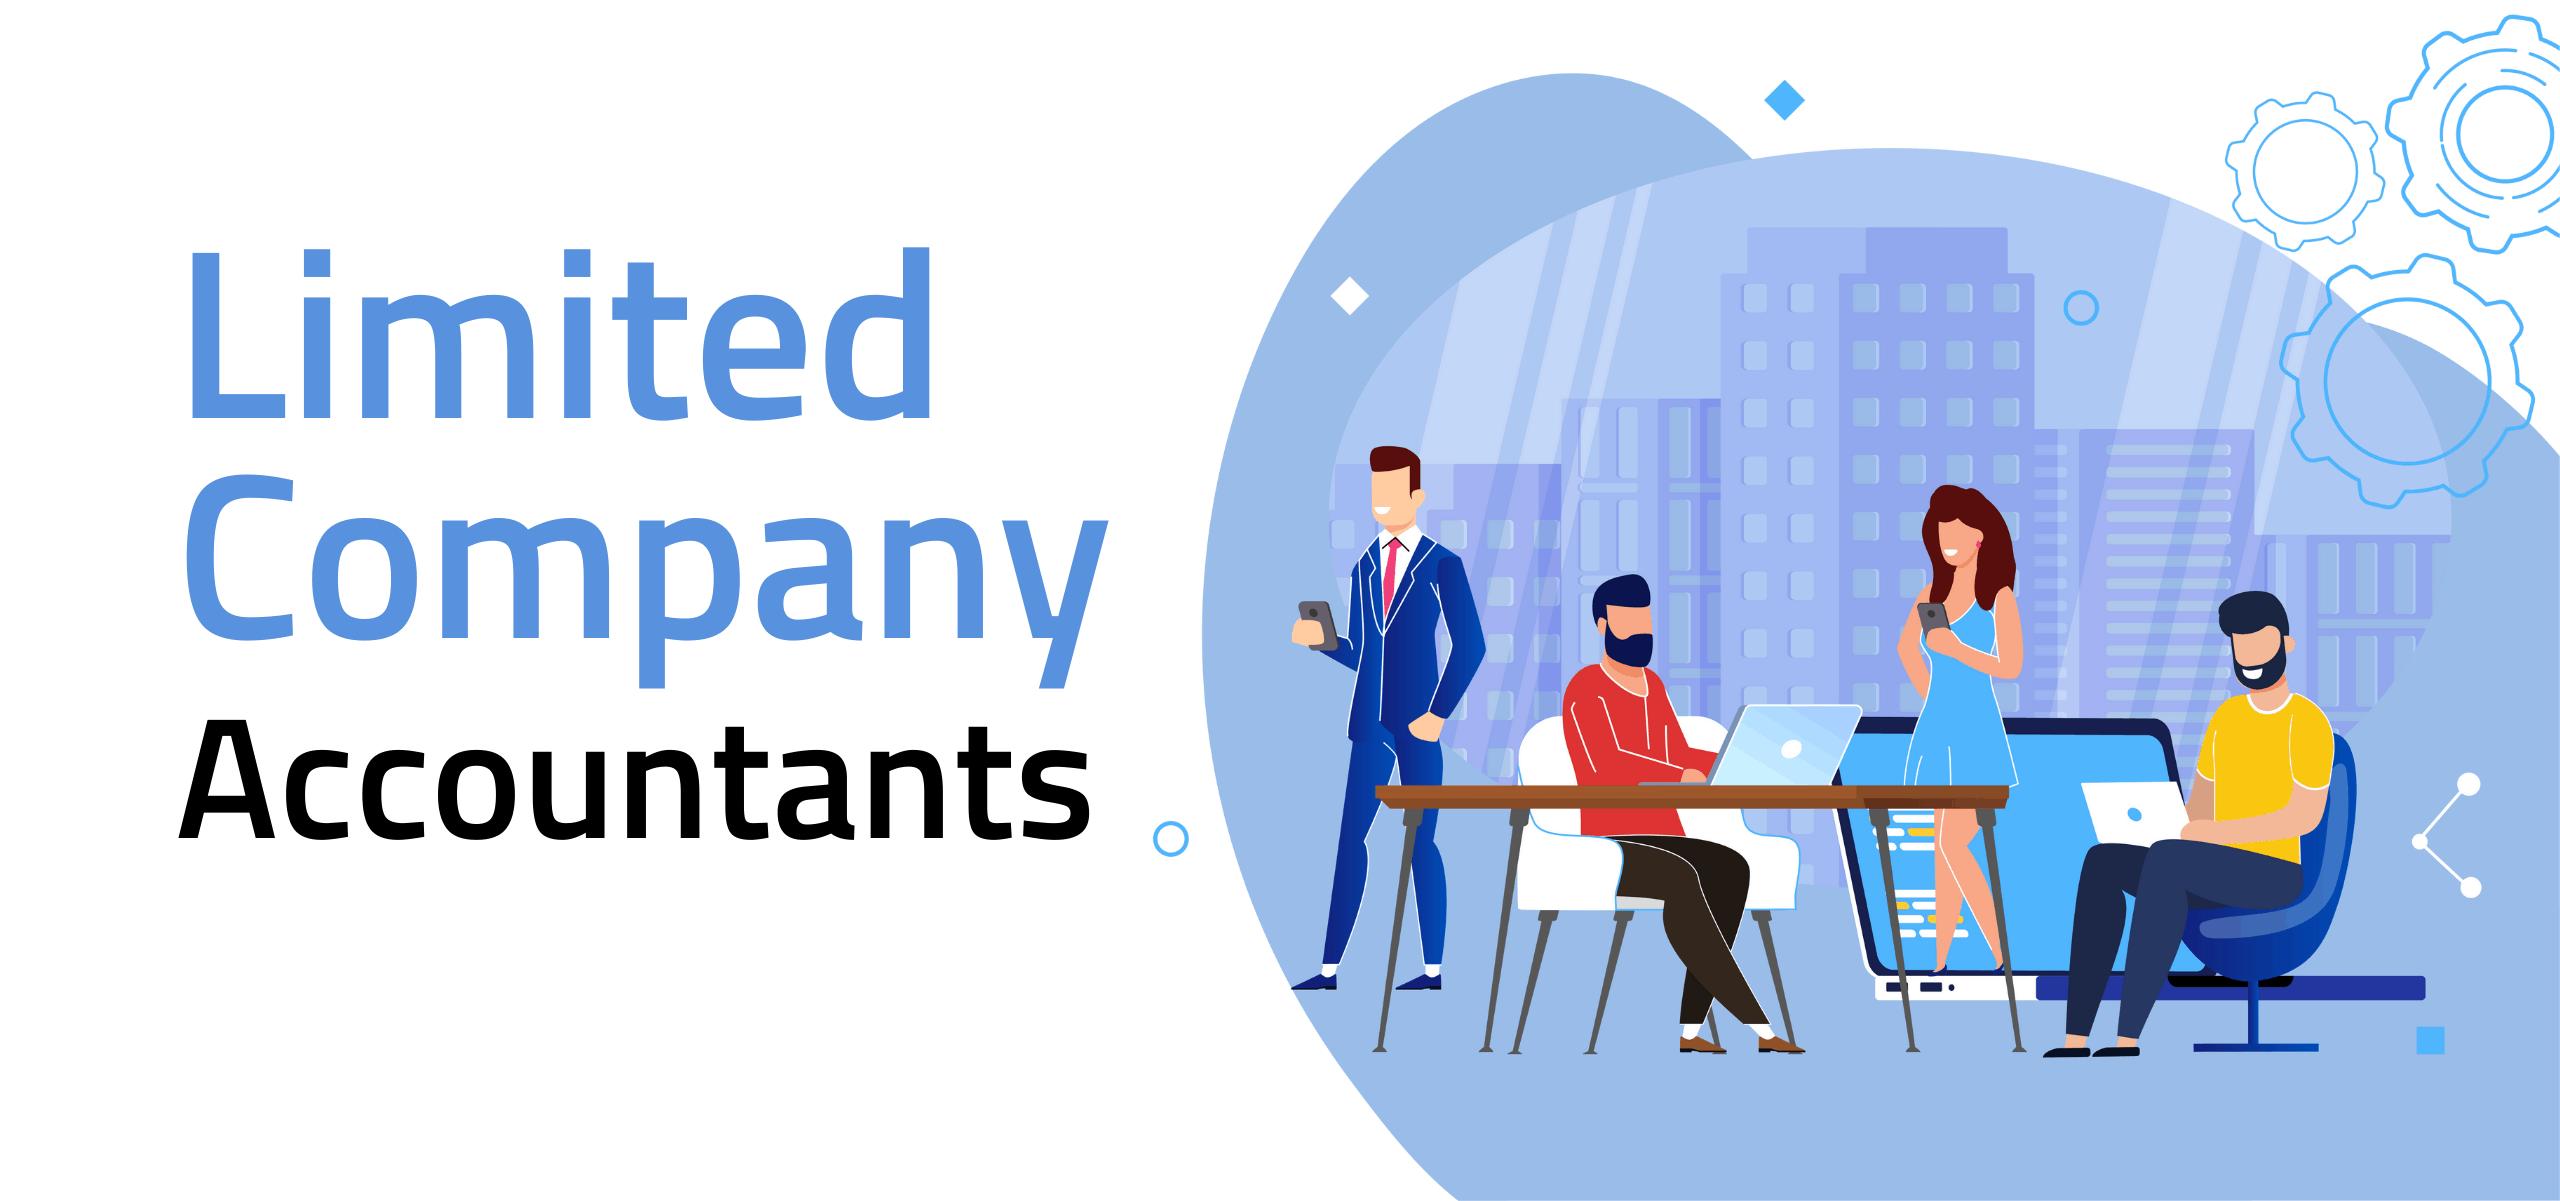 Limited Company Accountants